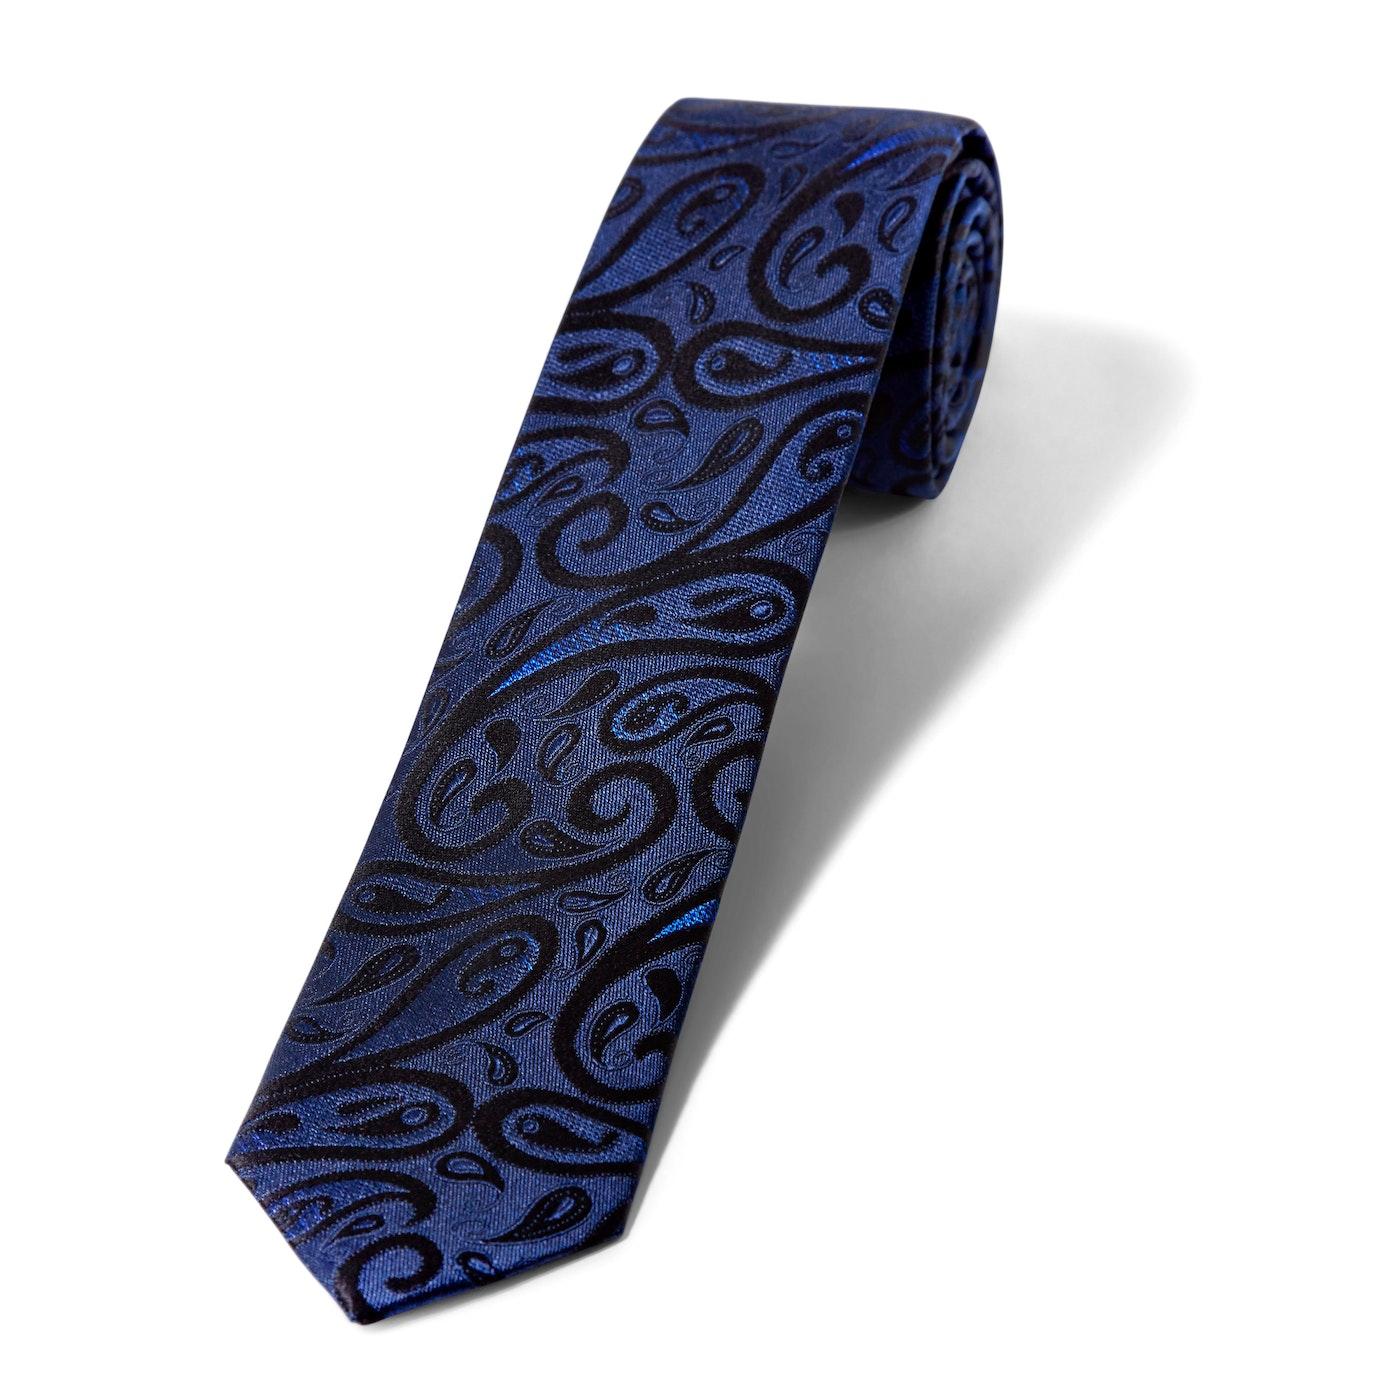 Skinny Navy with Black Paisley Tie